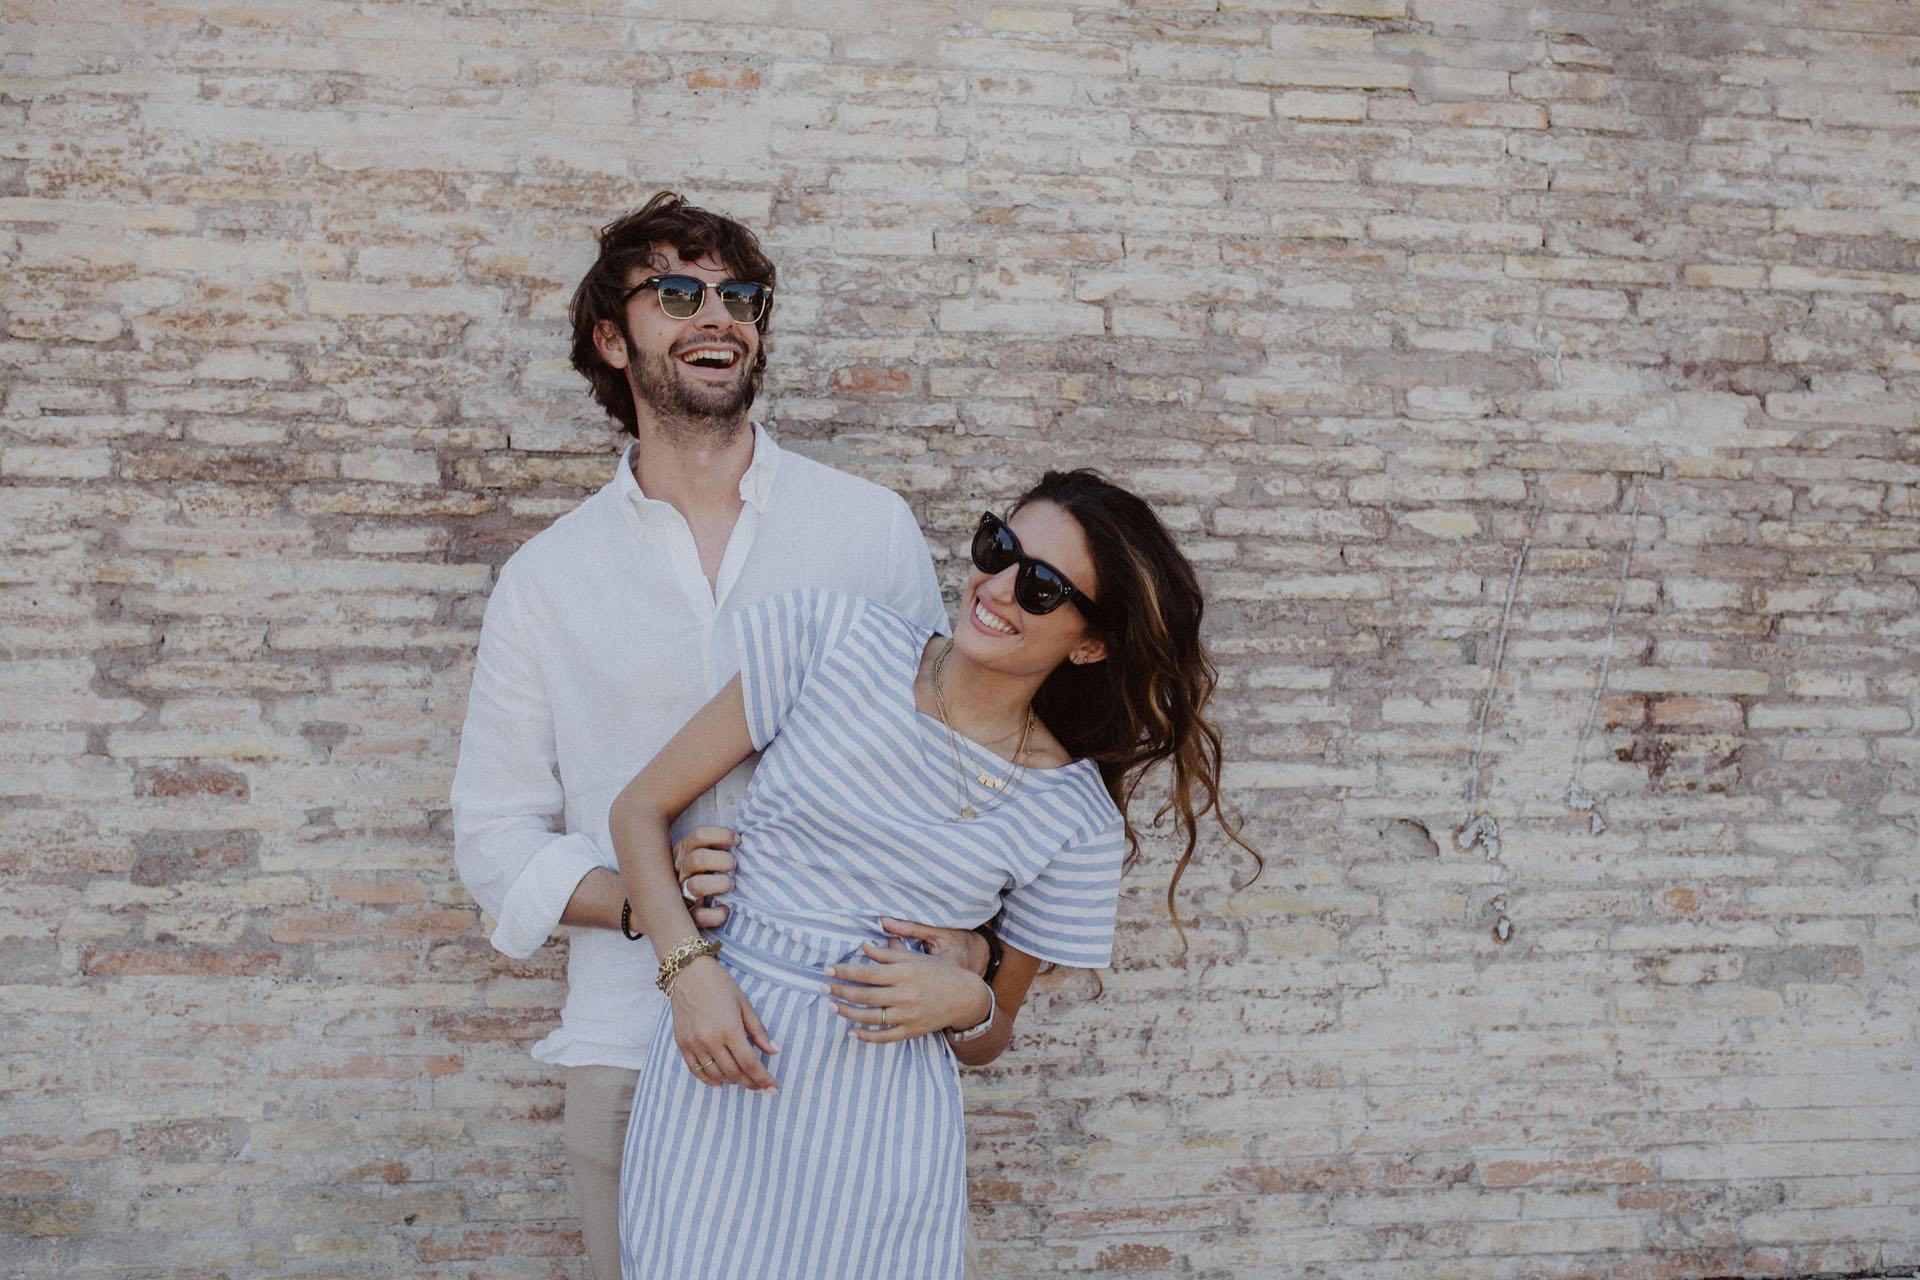 coupleshooting-roma-hochzeitsfotografen-wien-agnesundandi-32